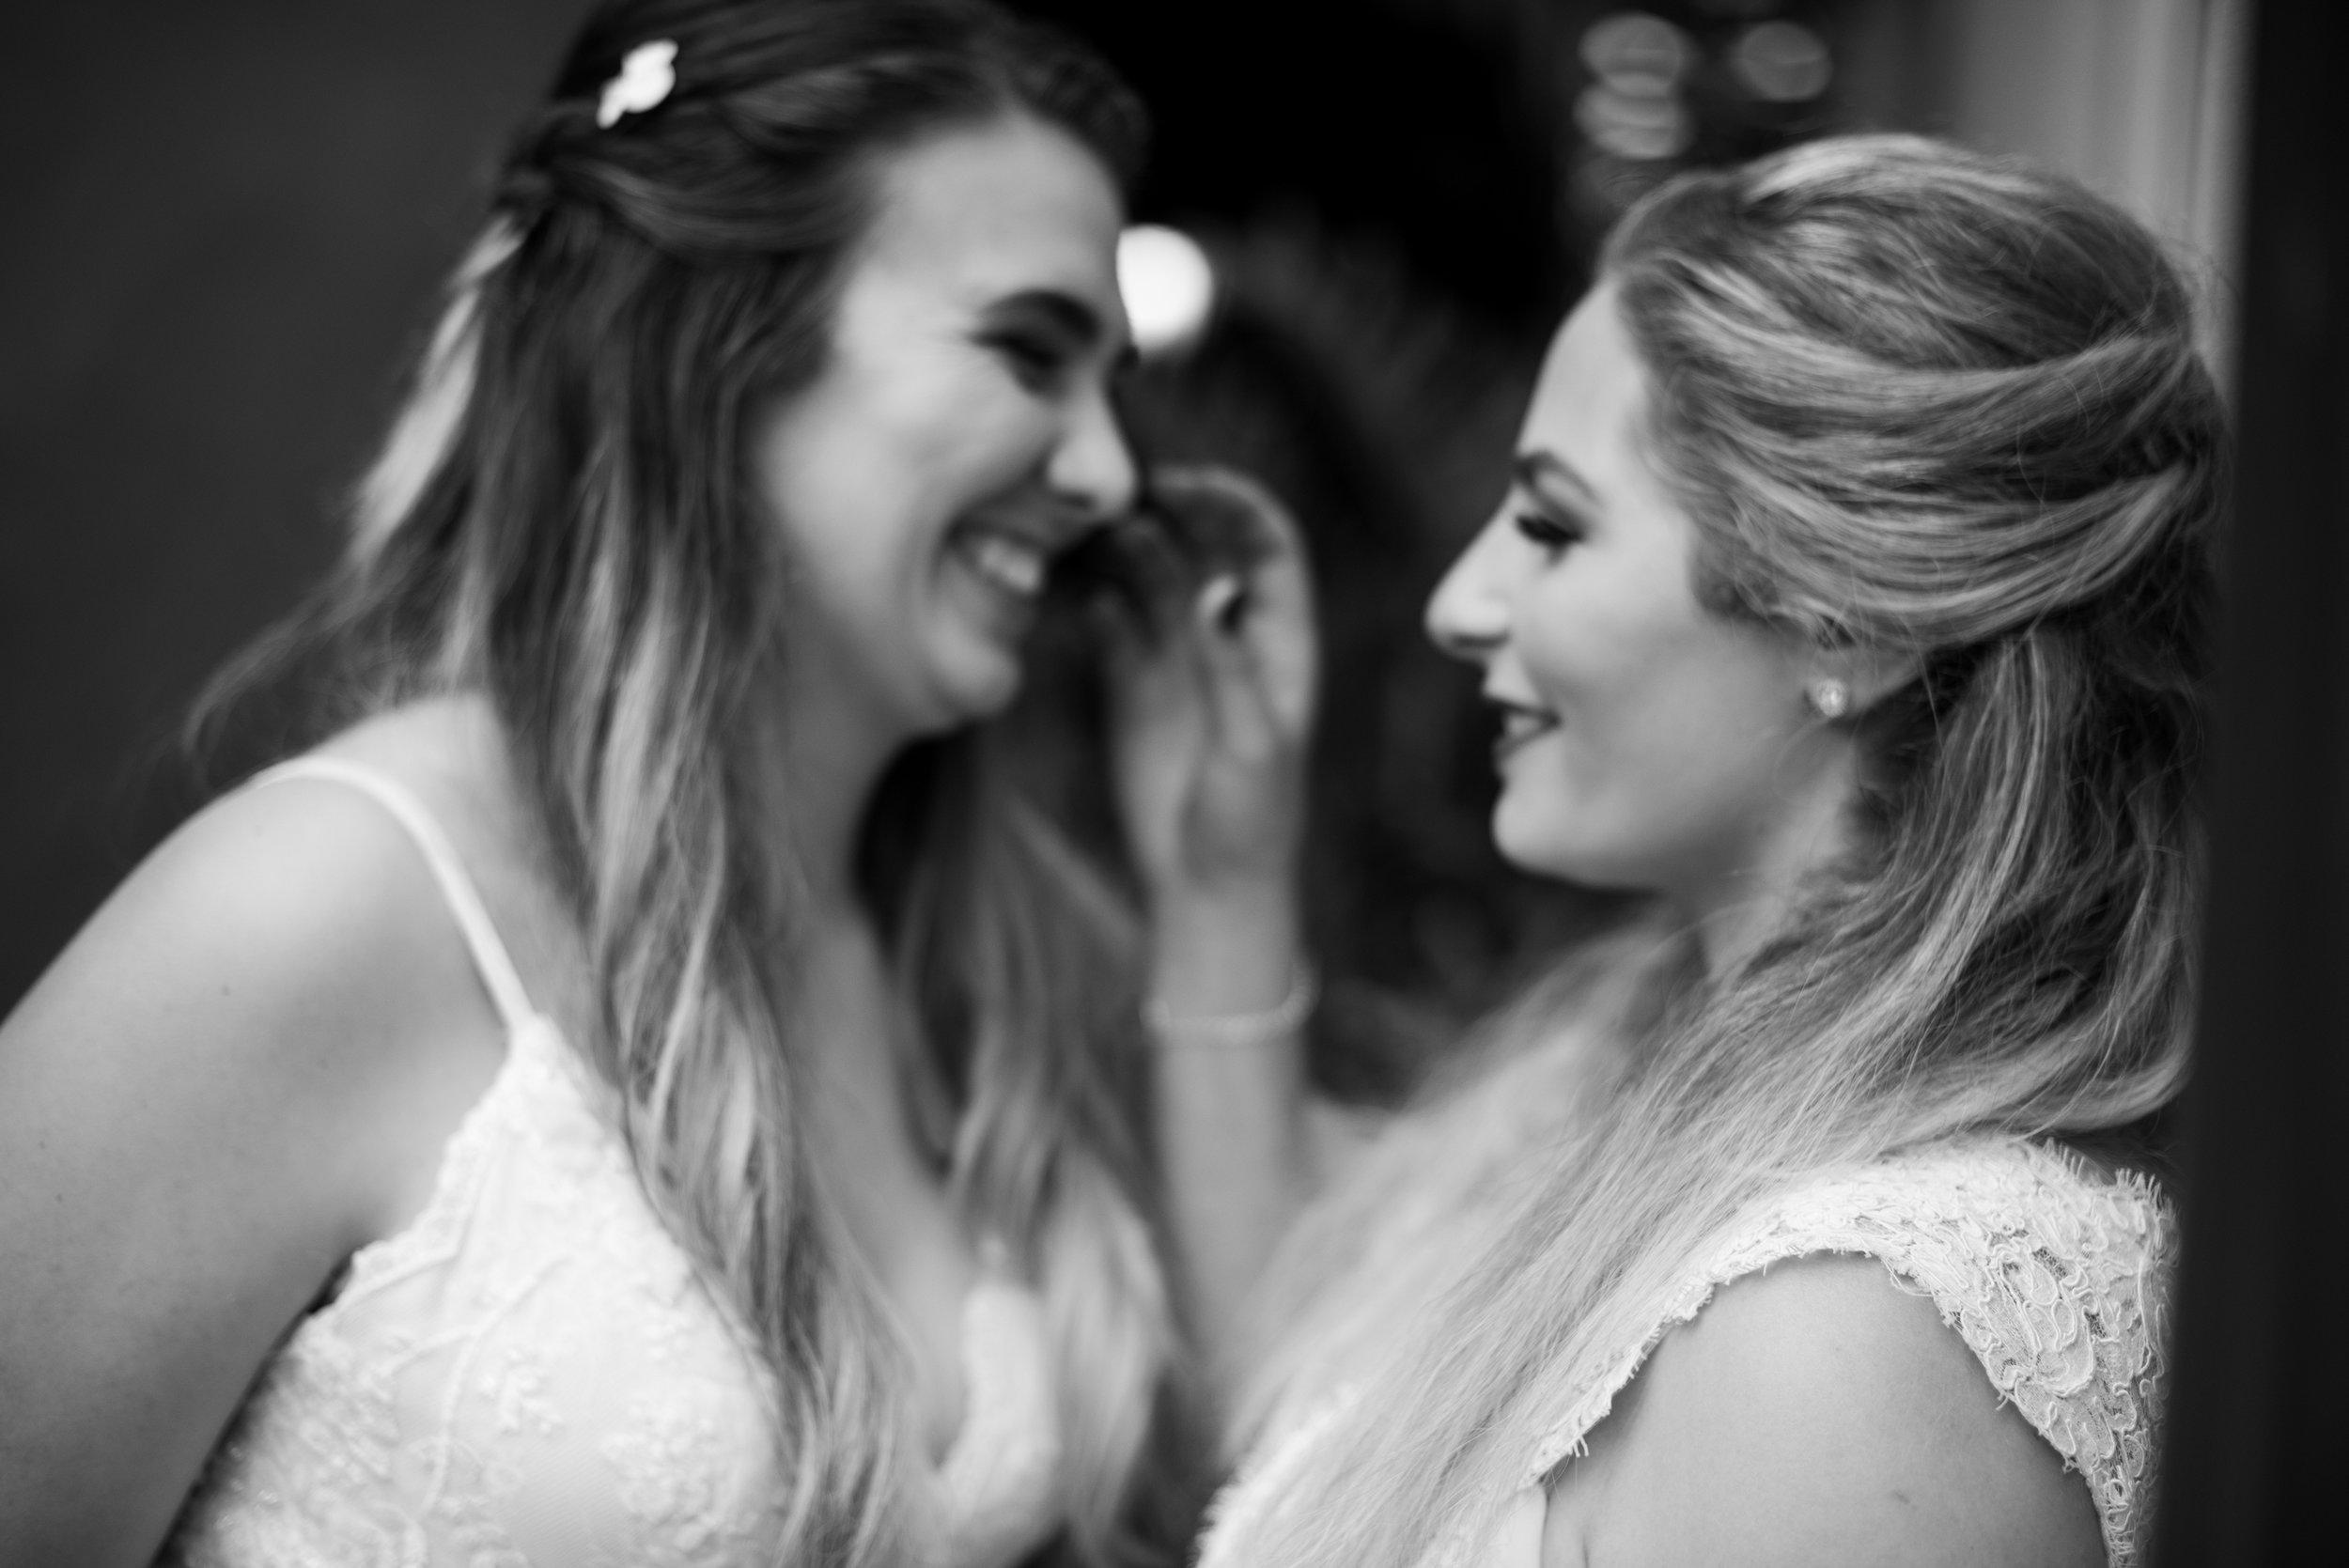 st-augustine-photographer-st-augustine-gay-wedding-sam-sex-wedding-photographer-sarah-annay-photography-white-room-weddings-42.jpg